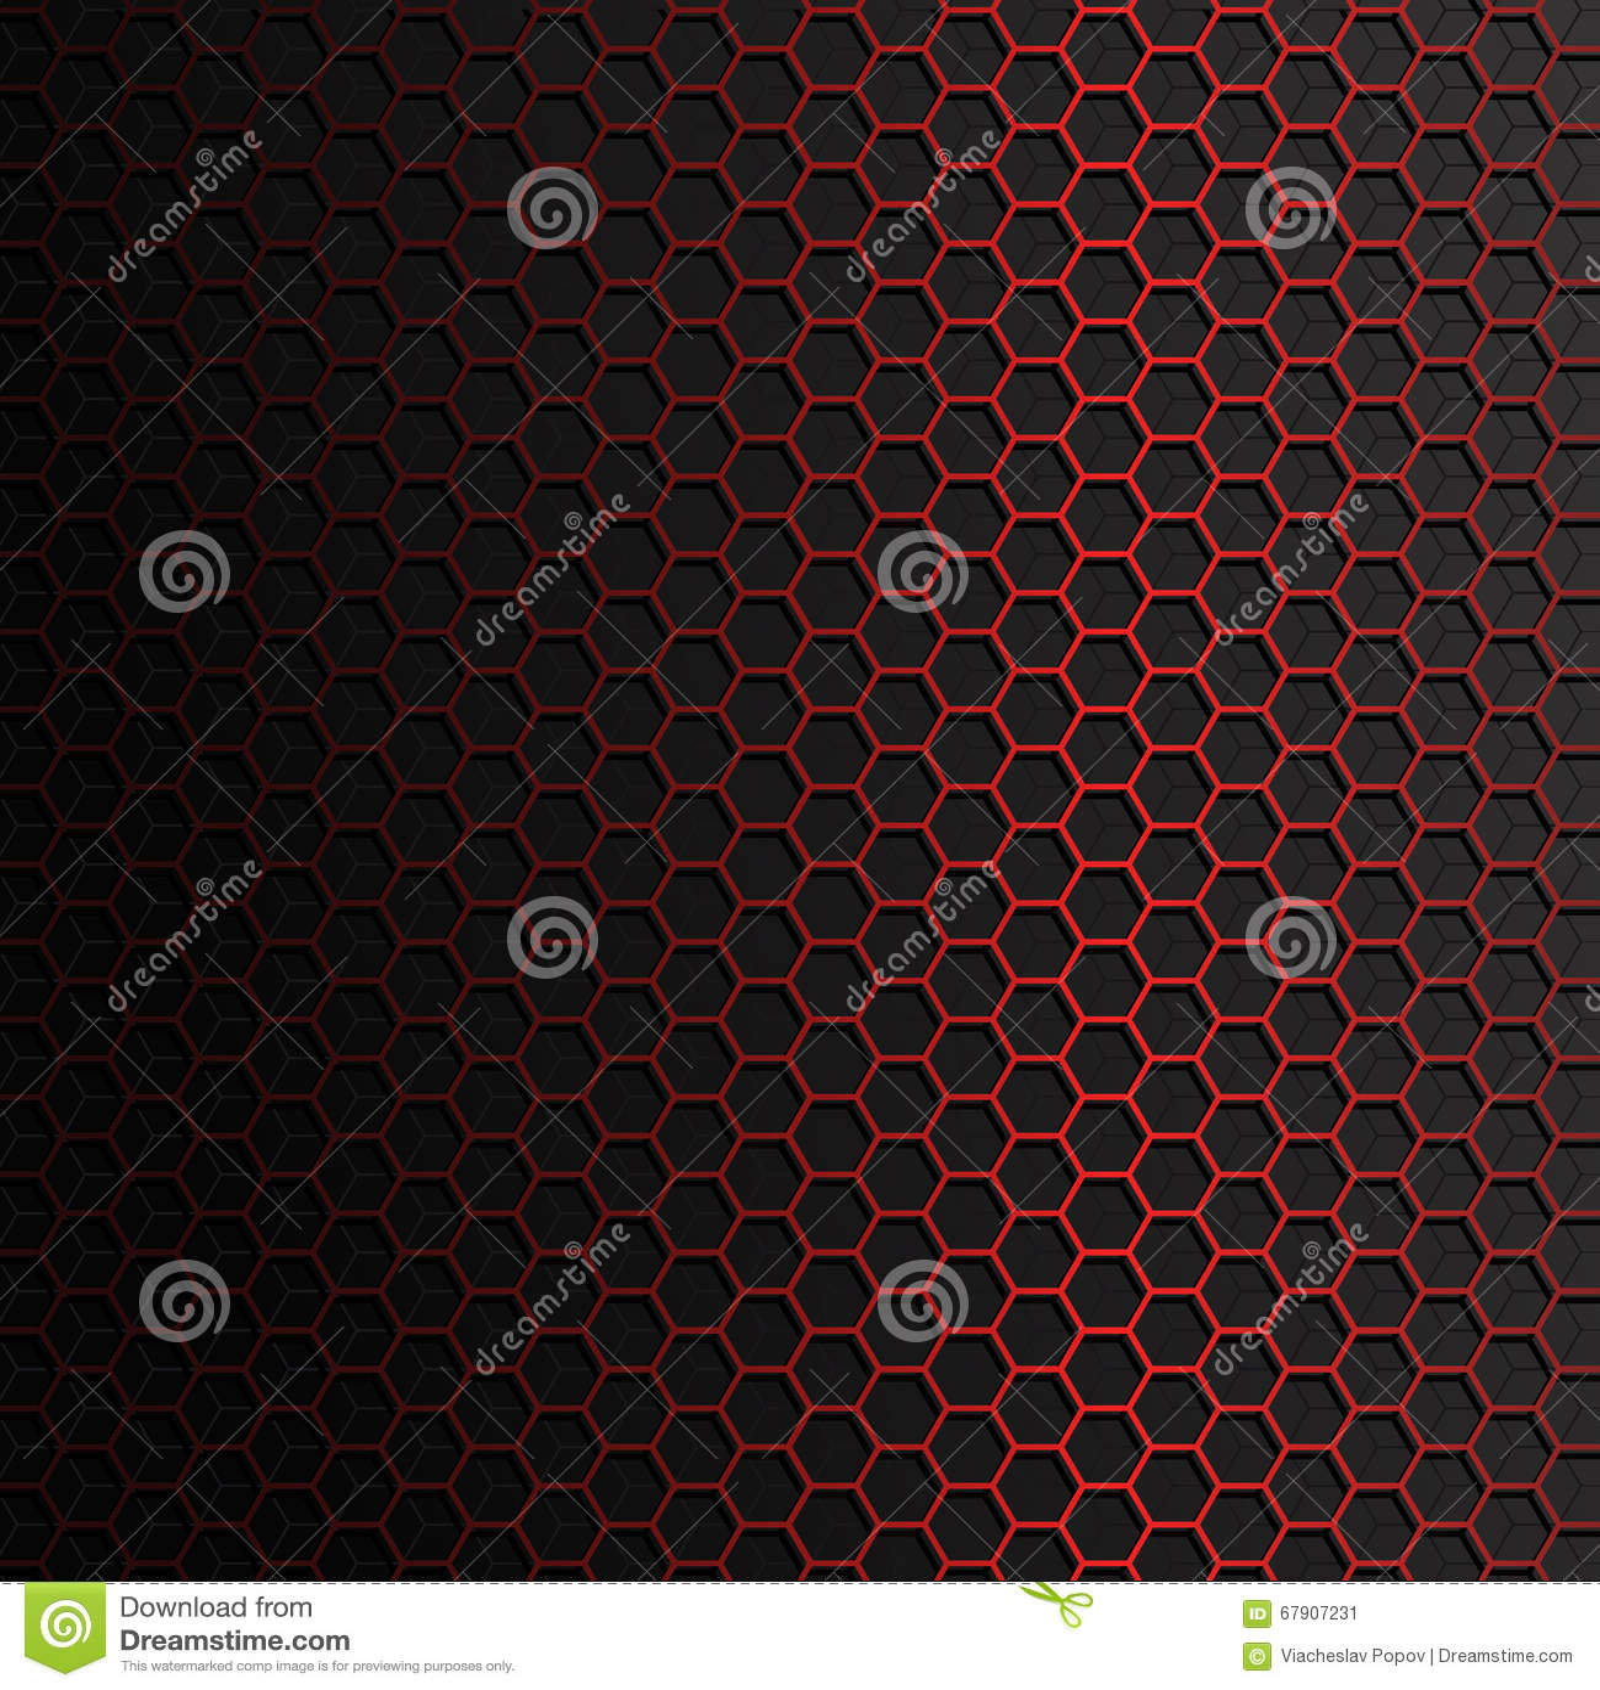 Vector background overlap dimension modern website design